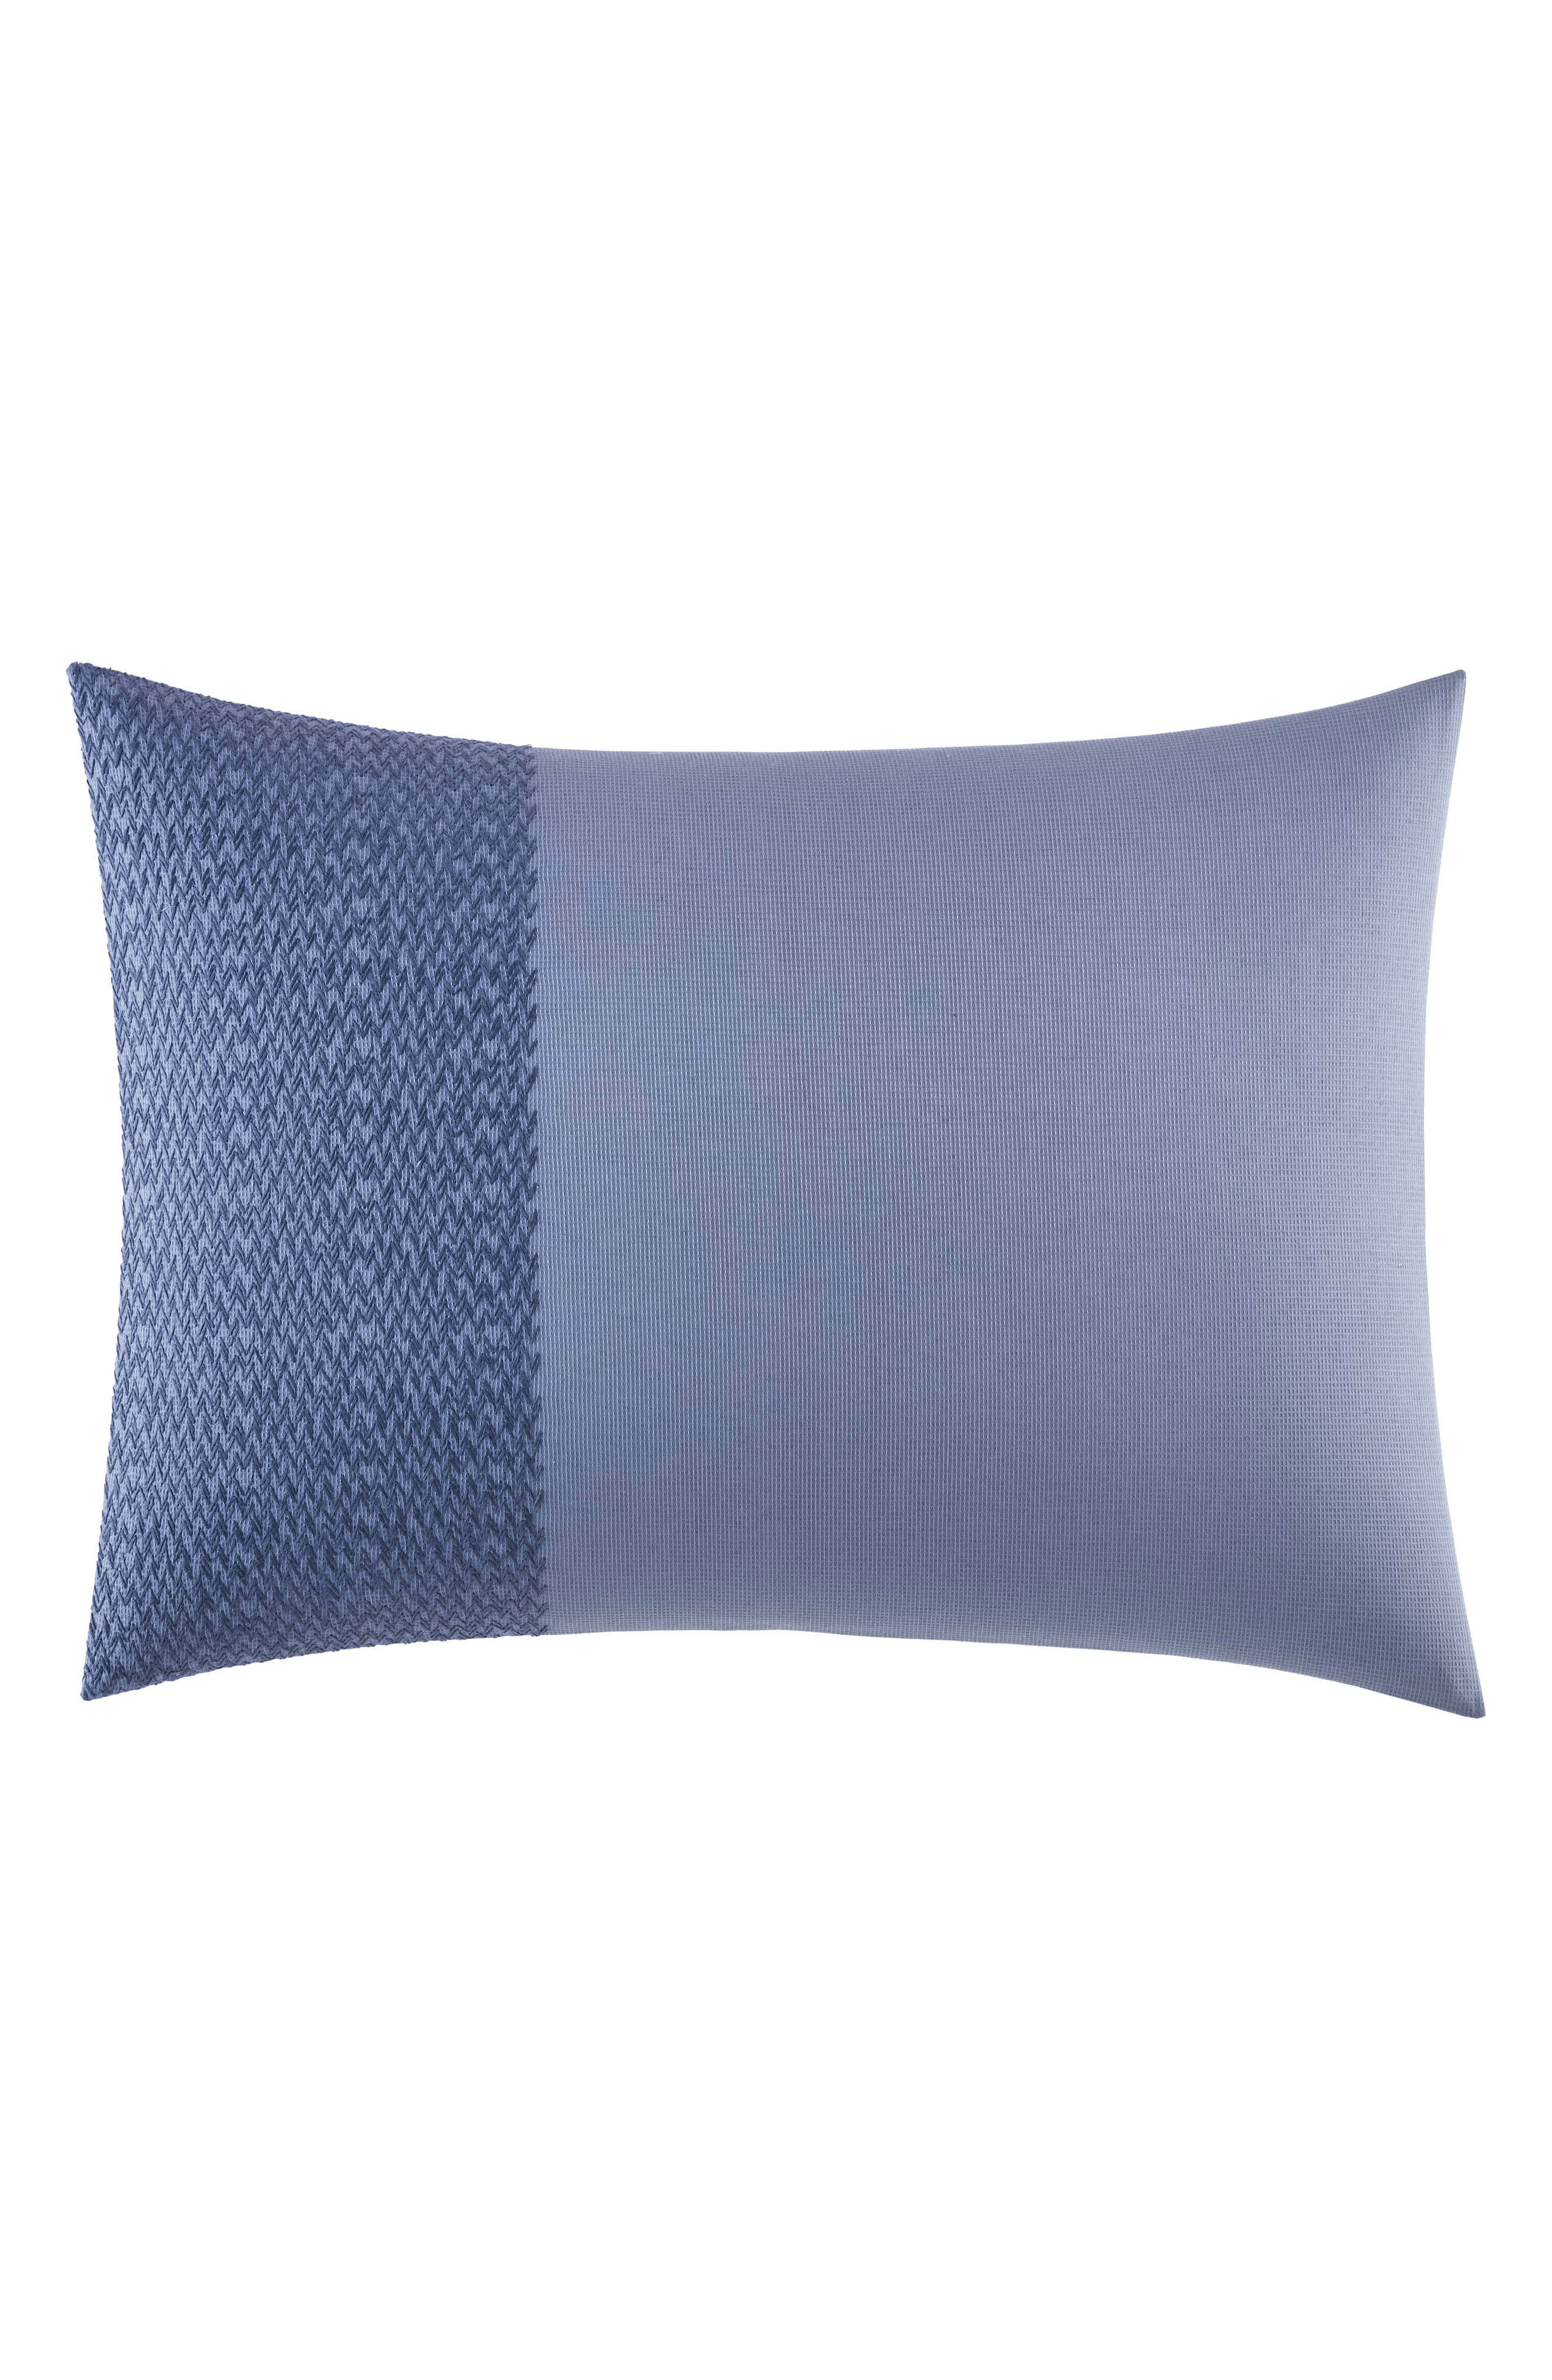 Chevron Breakfast Pillow,                             Main thumbnail 1, color,                             500